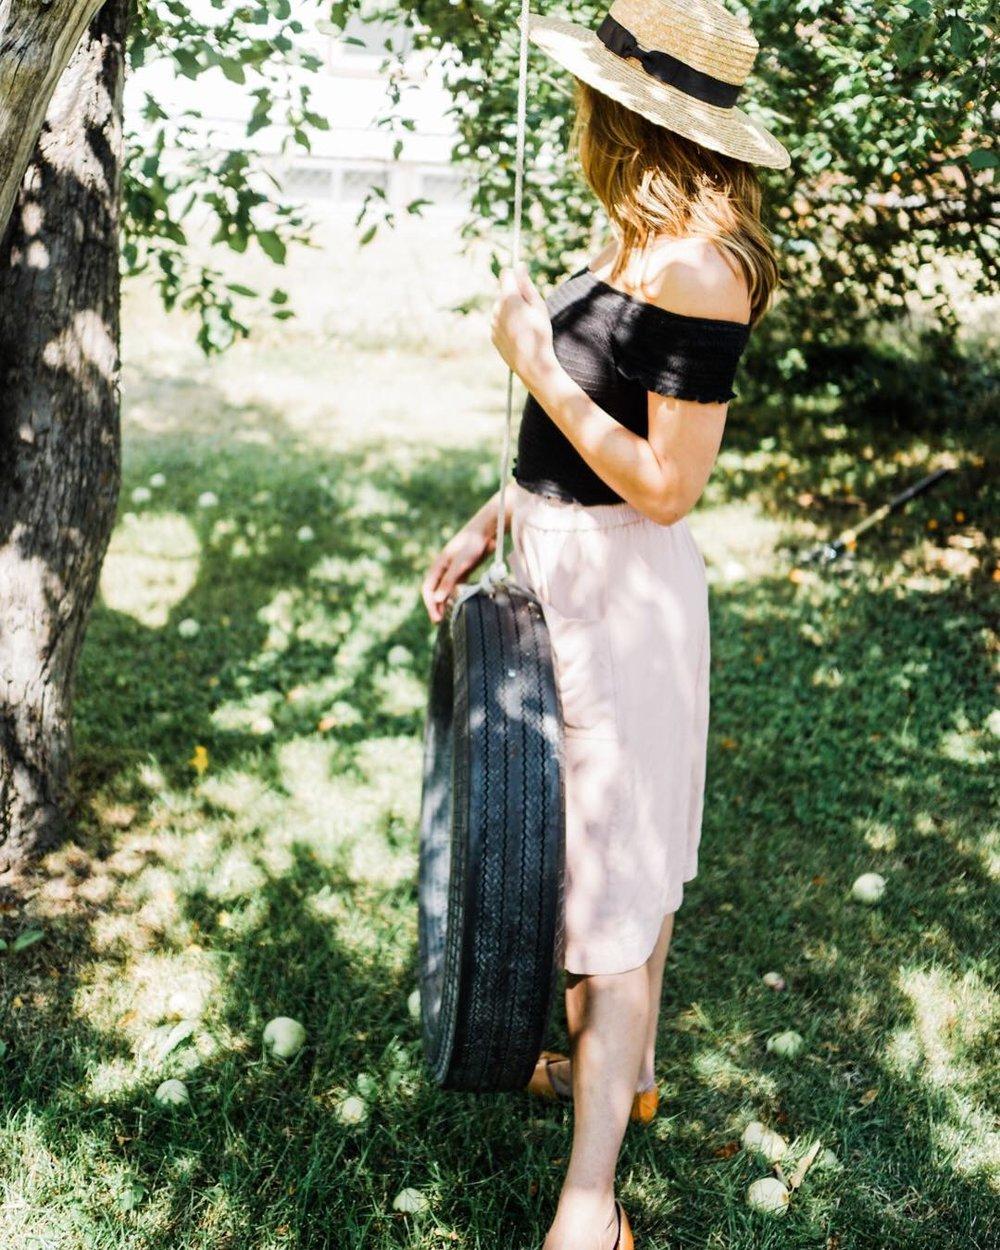 kelsey-a-balancing-peach